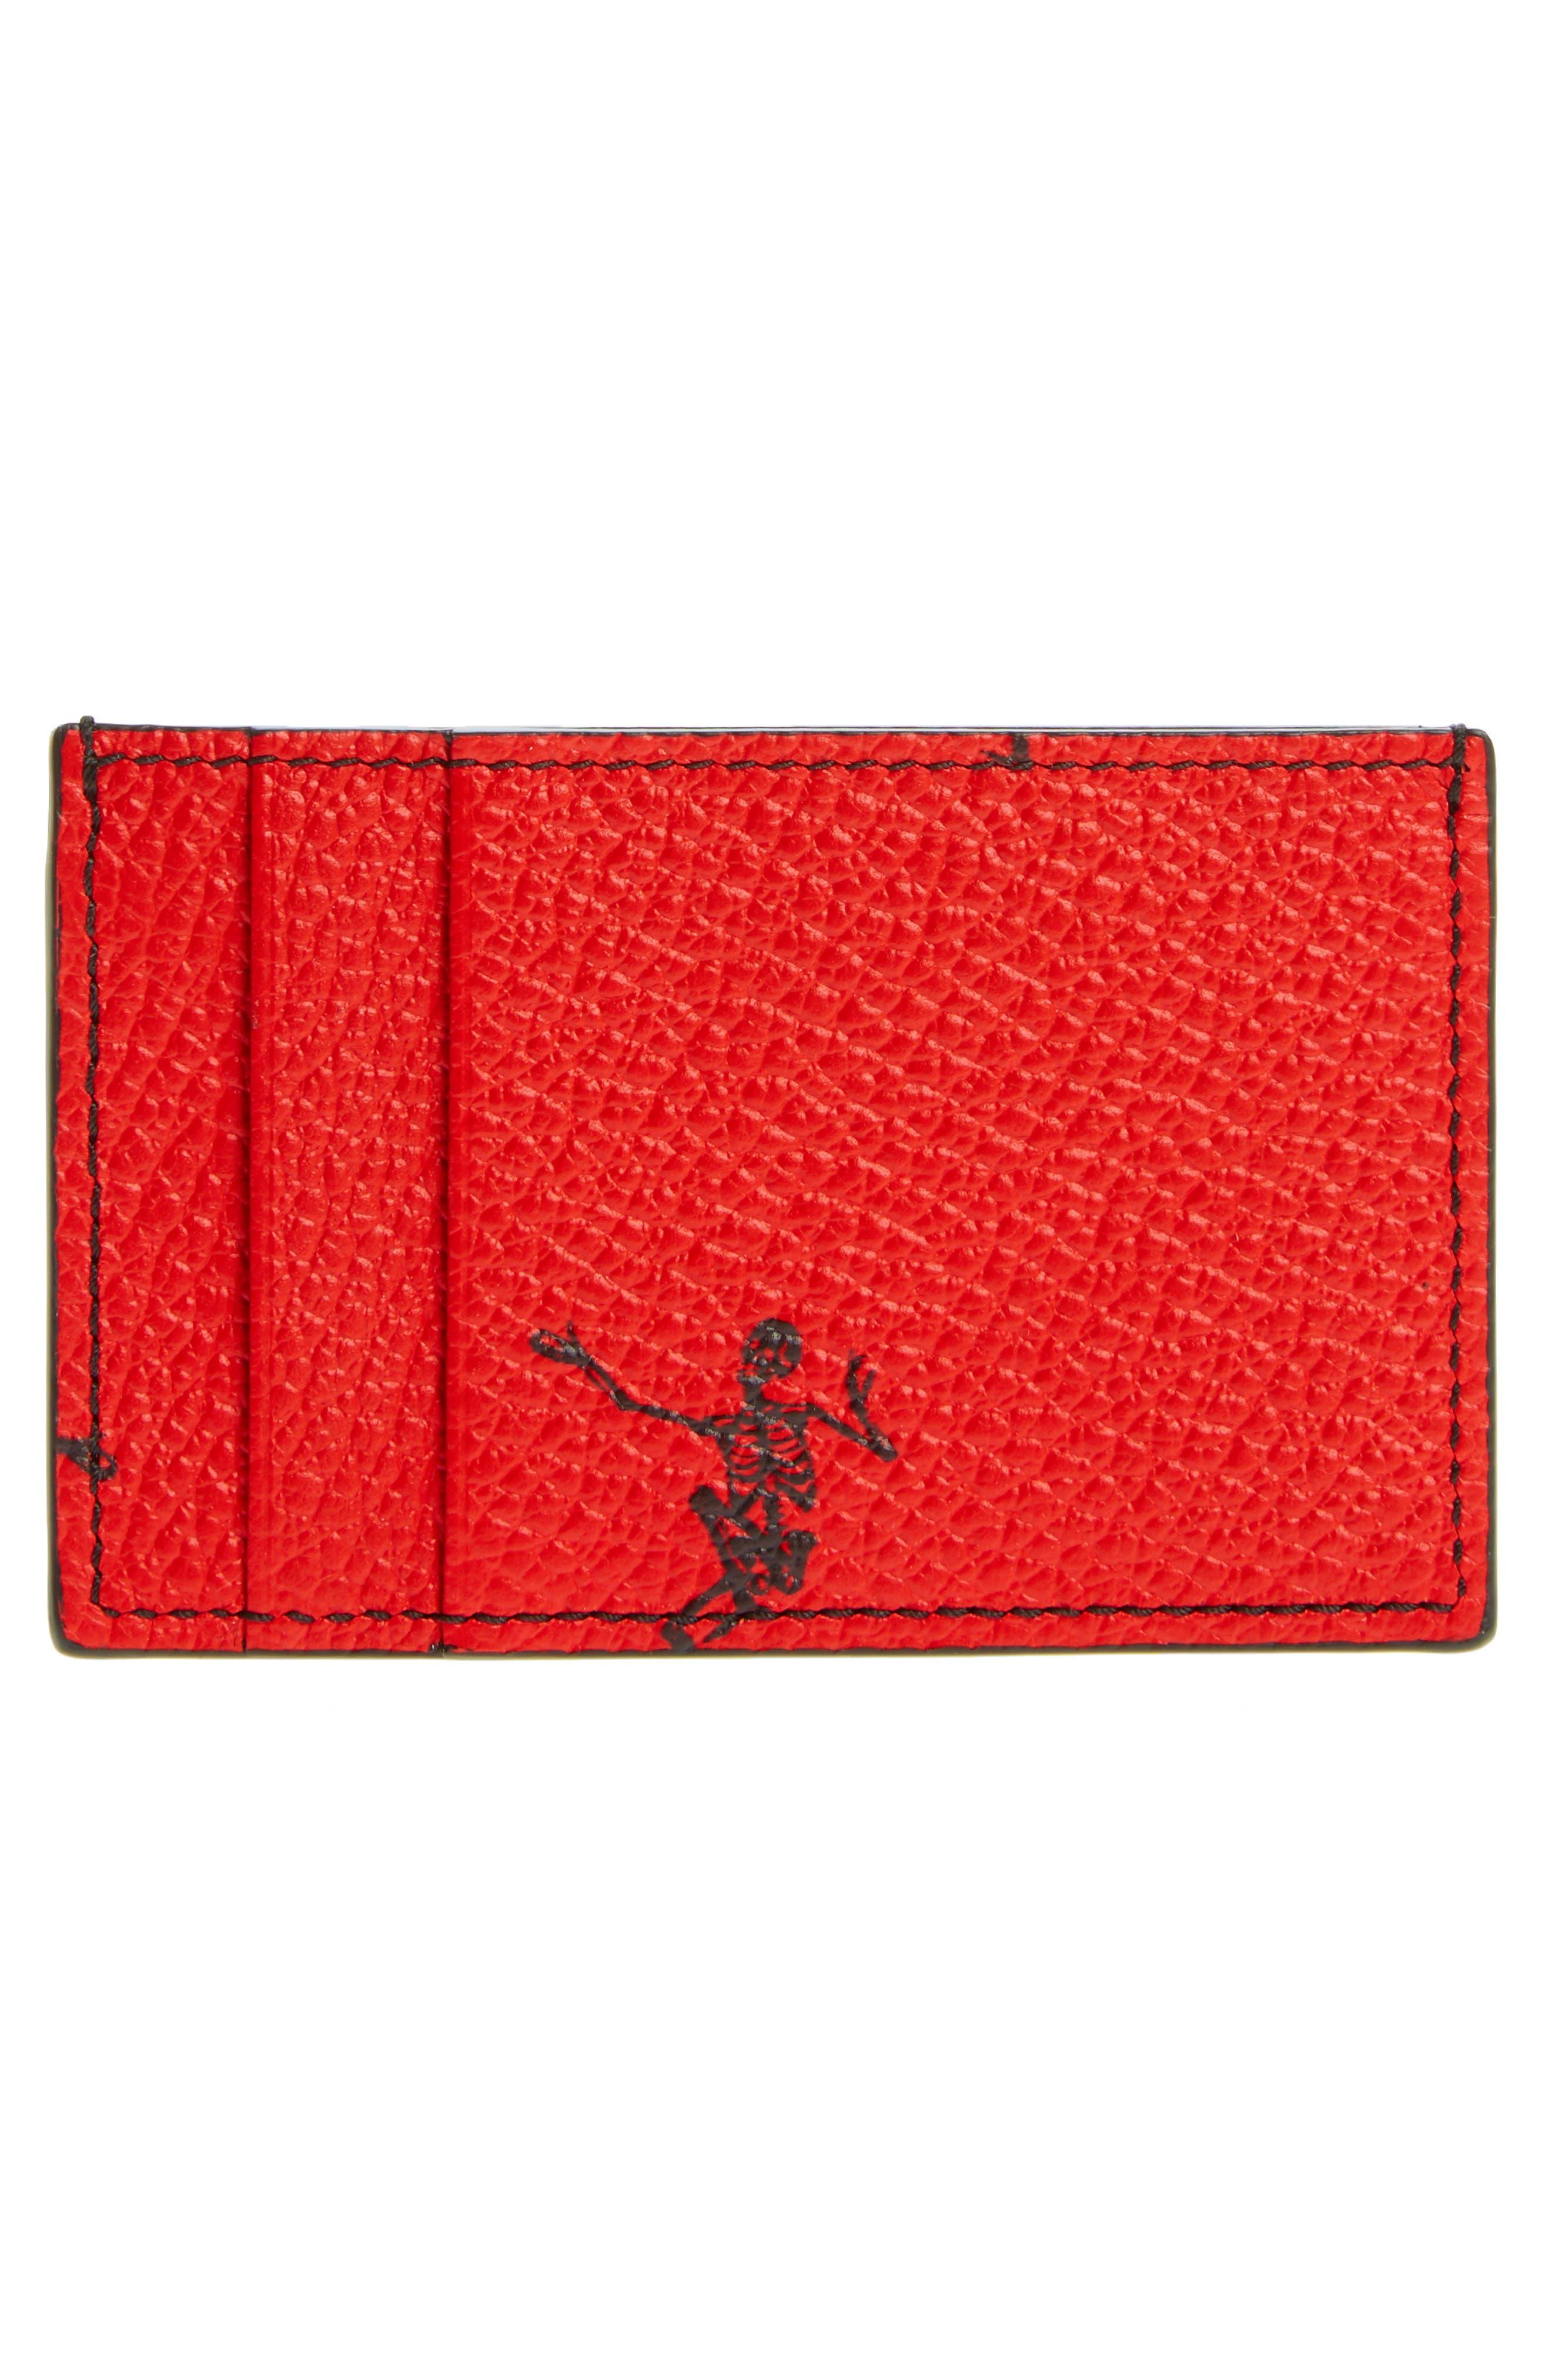 Dancing Skeleton Card Case,                             Alternate thumbnail 4, color,